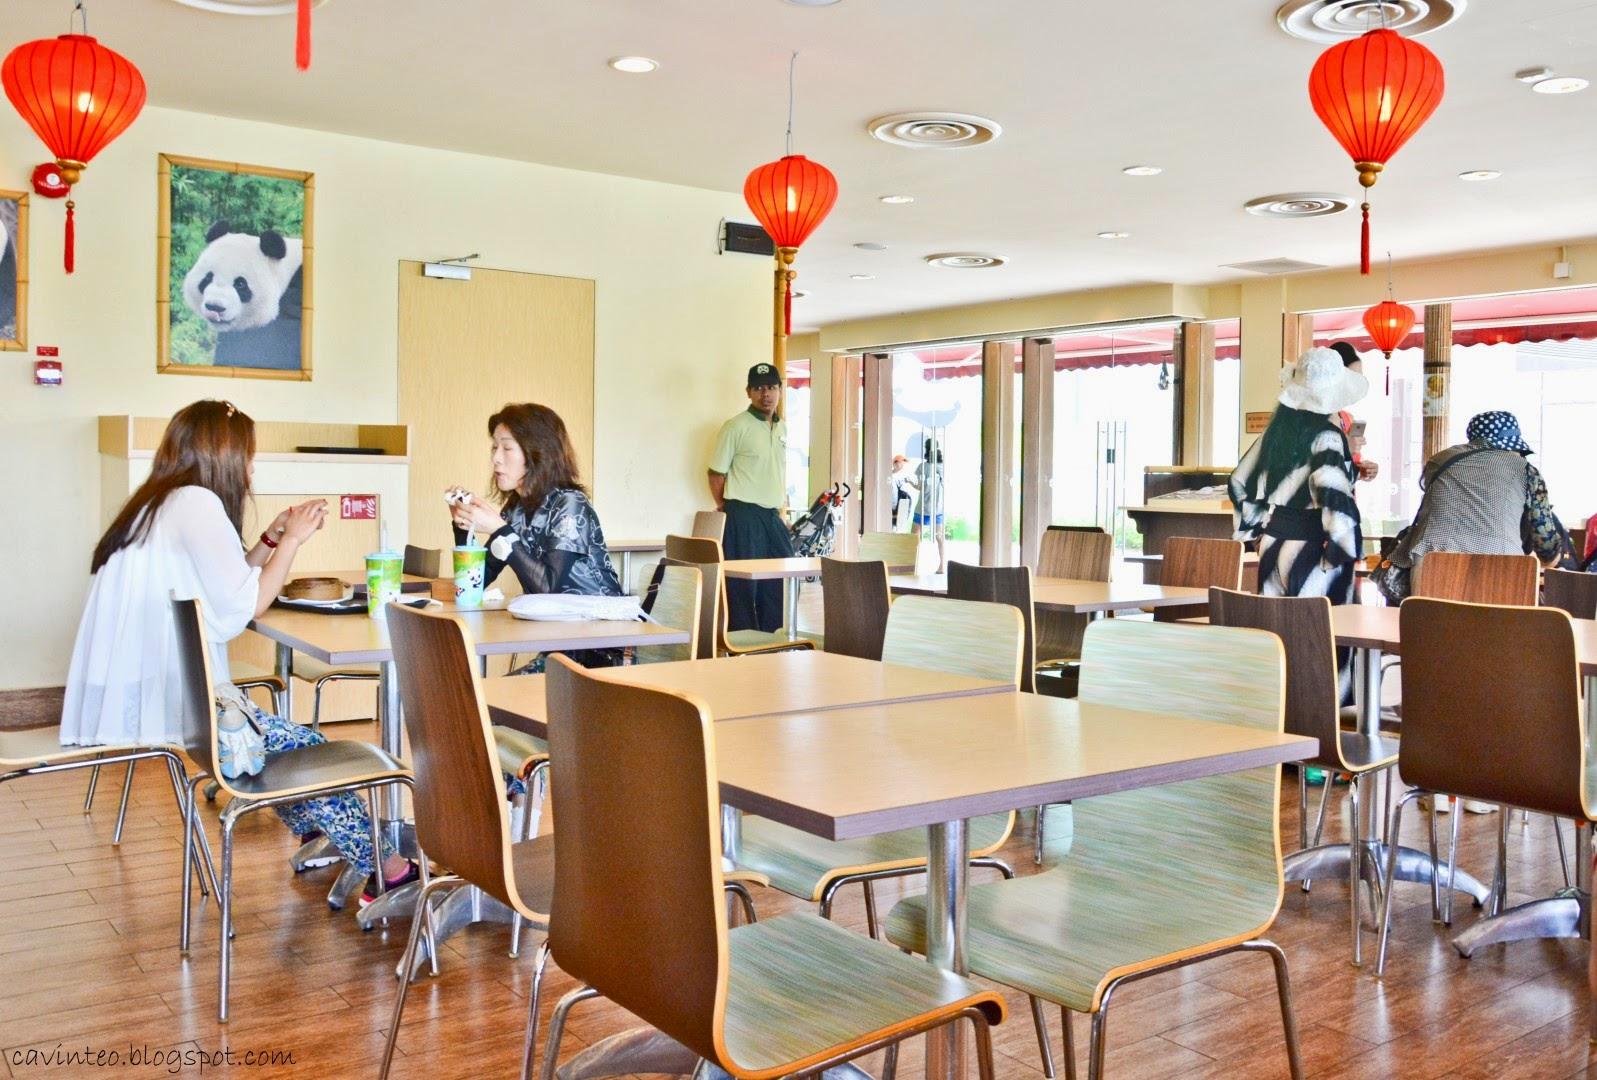 Entree Kibbles: Mama Panda Kitchen (熊猫妈妈小吃) - The Expensive ...